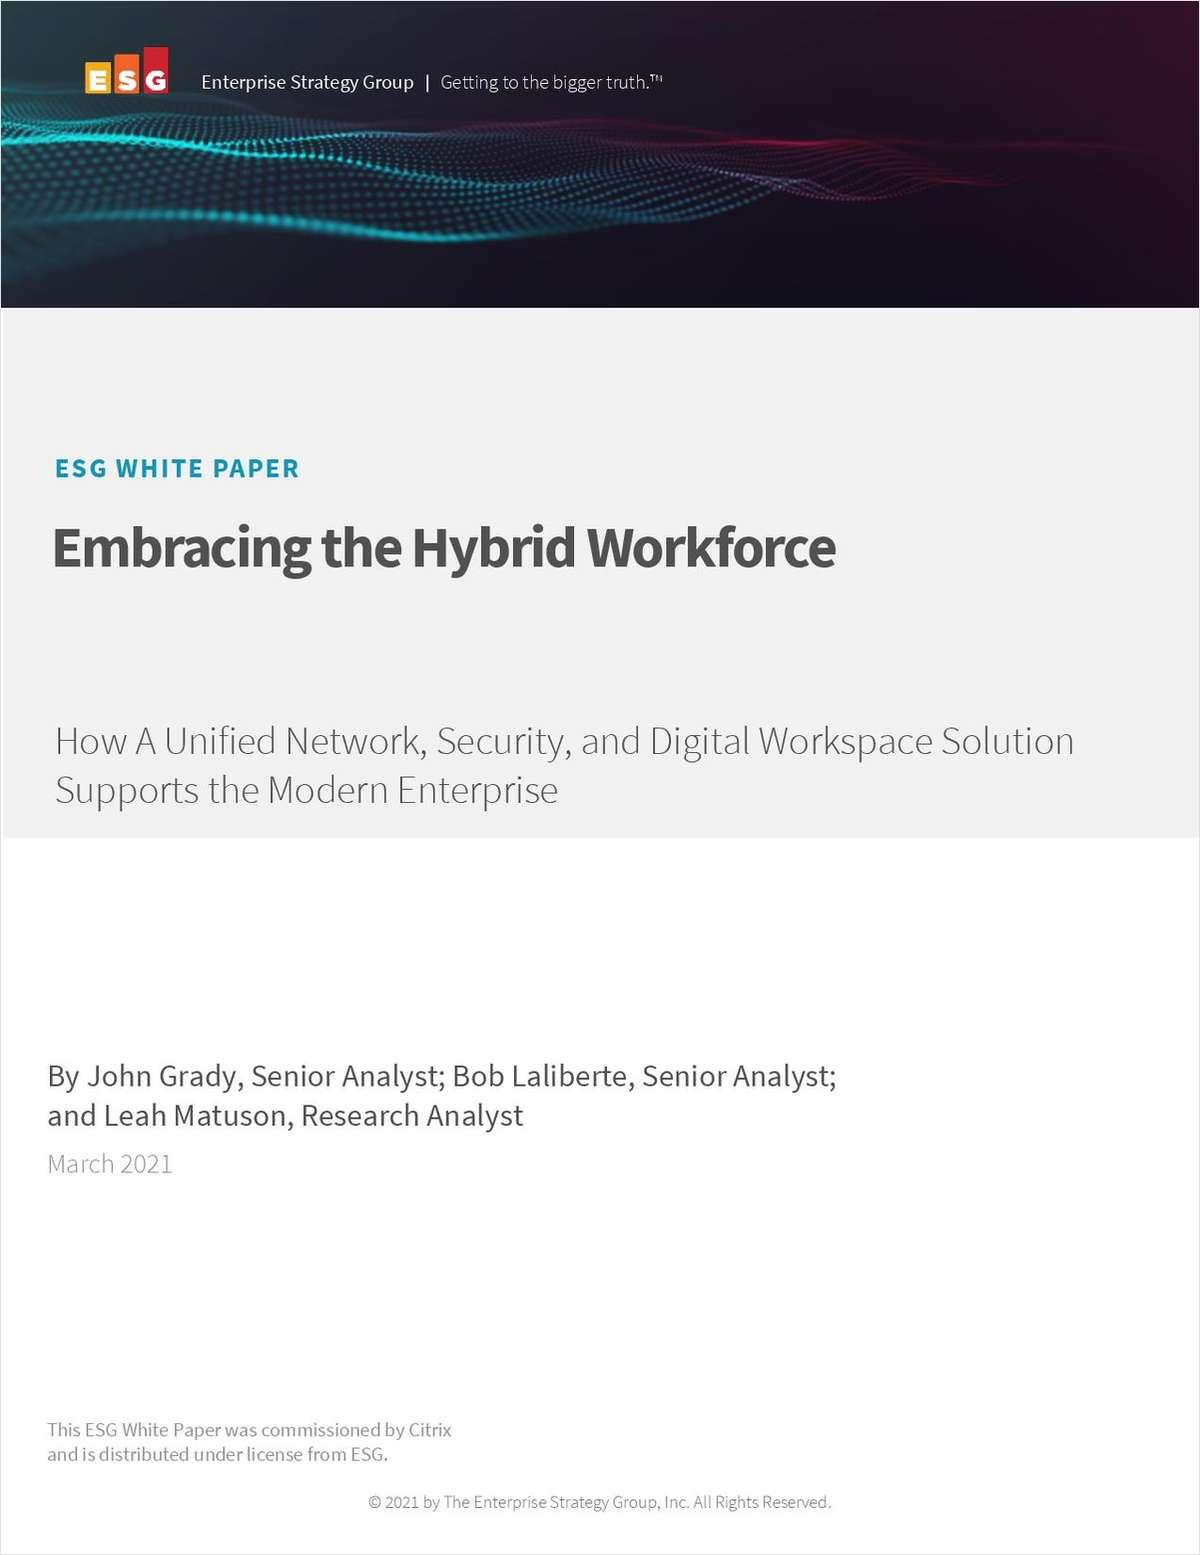 ESG Whitepaper: Embracing the Hybrid Workforce